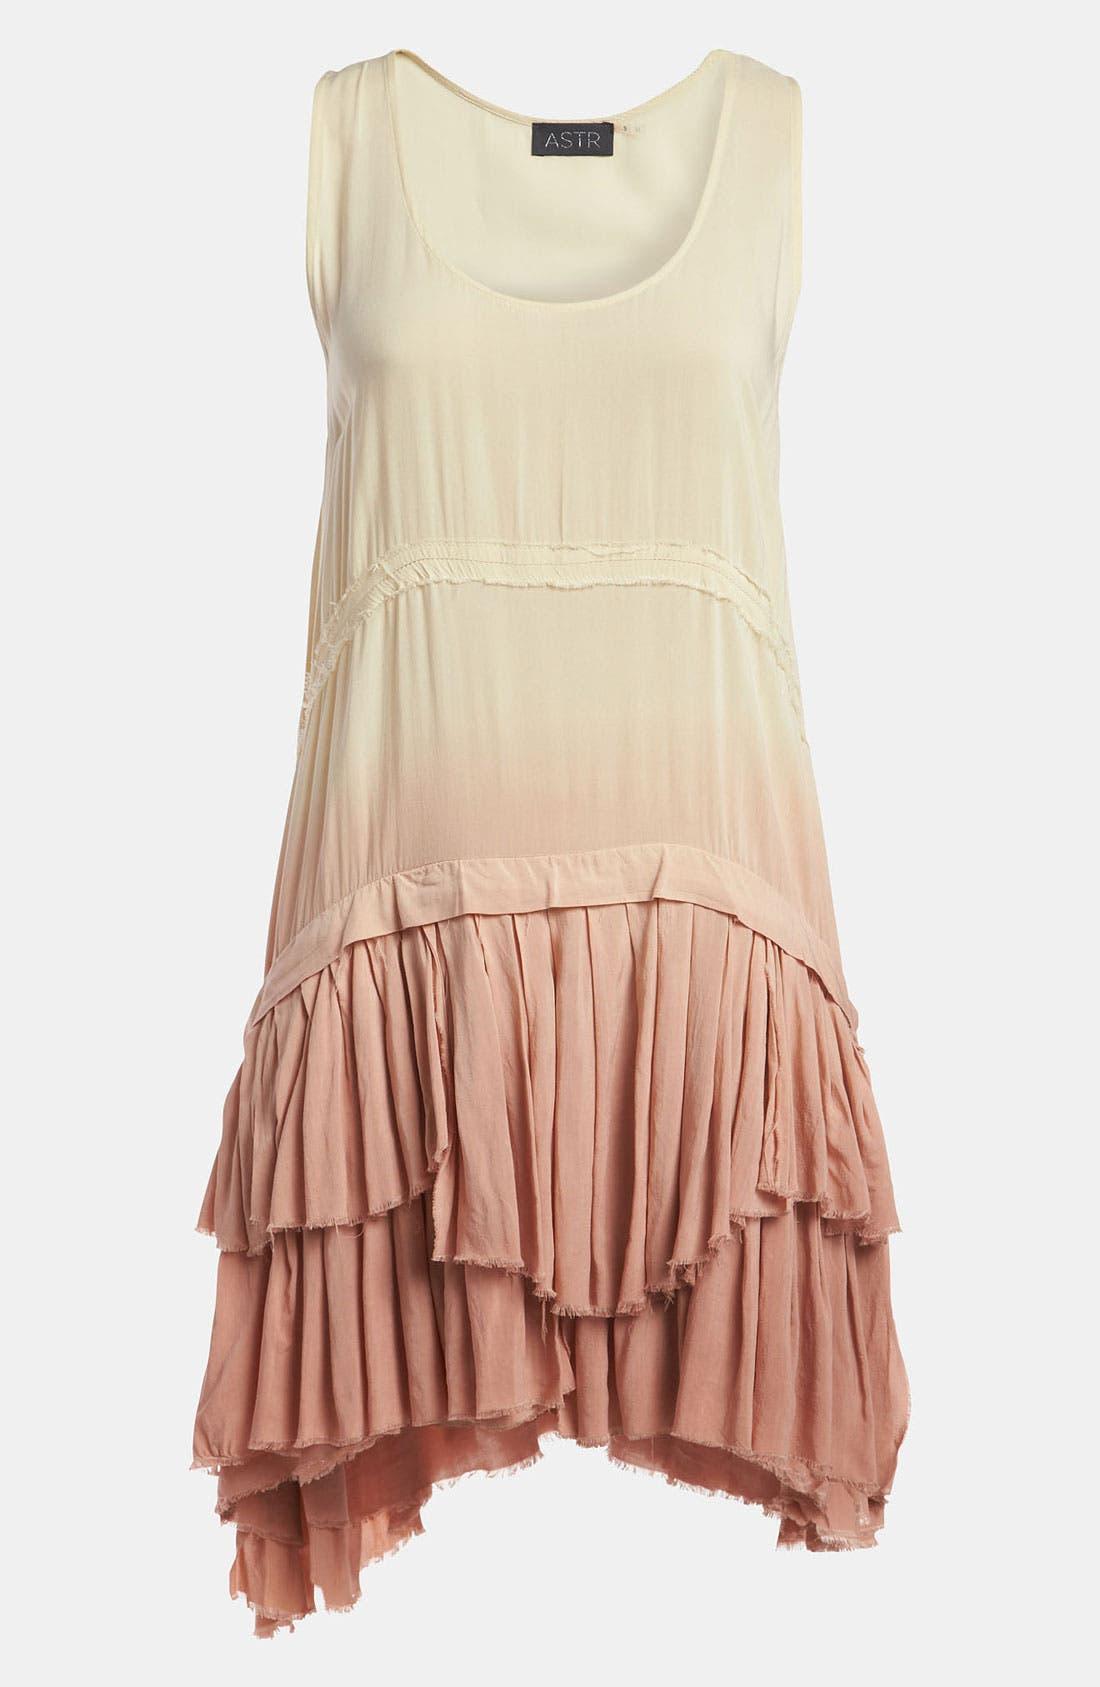 Main Image - ASTR 'Ra Ra Ruffle' Dip Dye Tank Dress